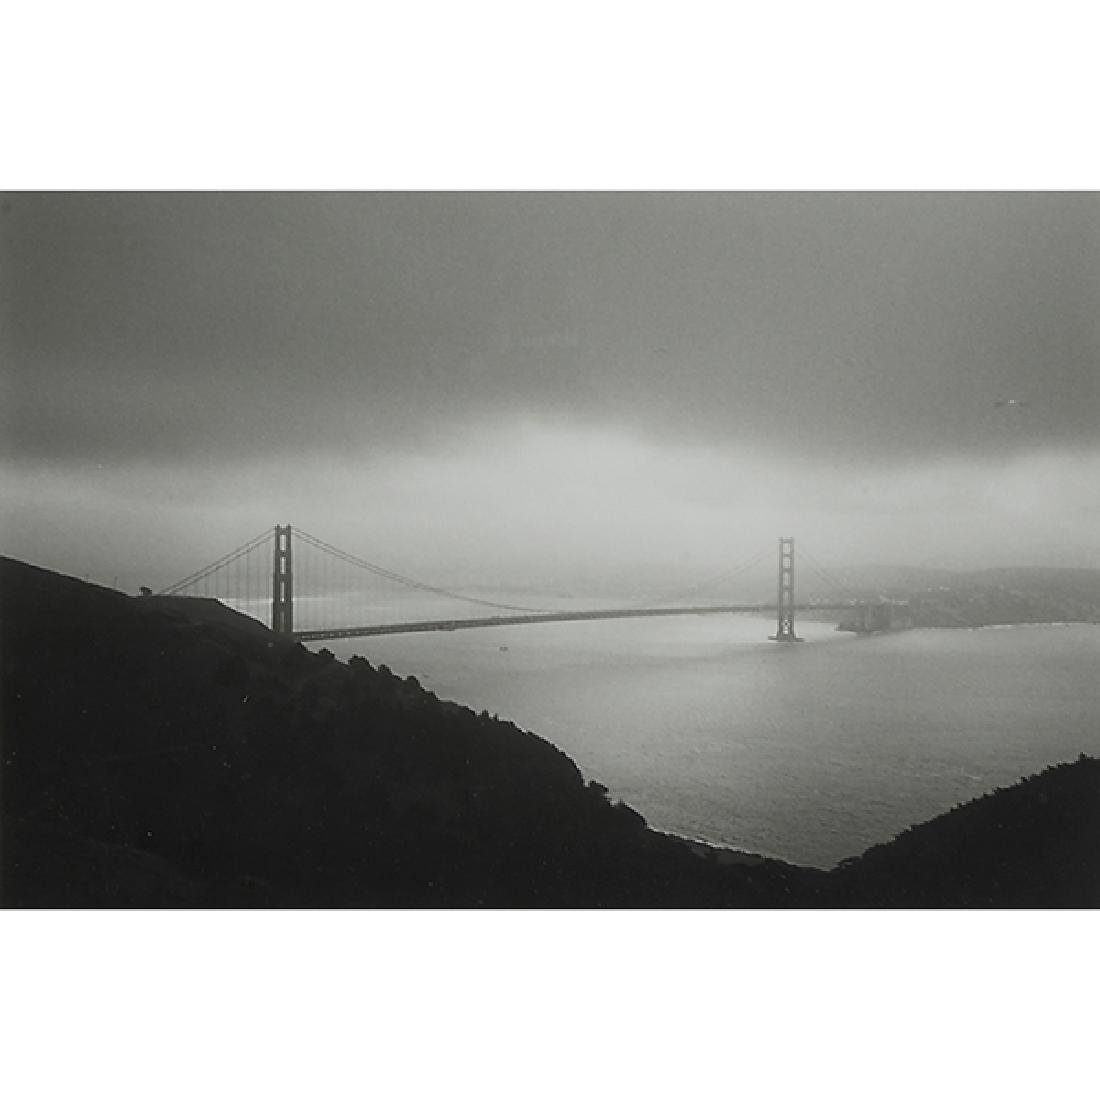 James F. Danis, (American, 20th century), Golden Gate